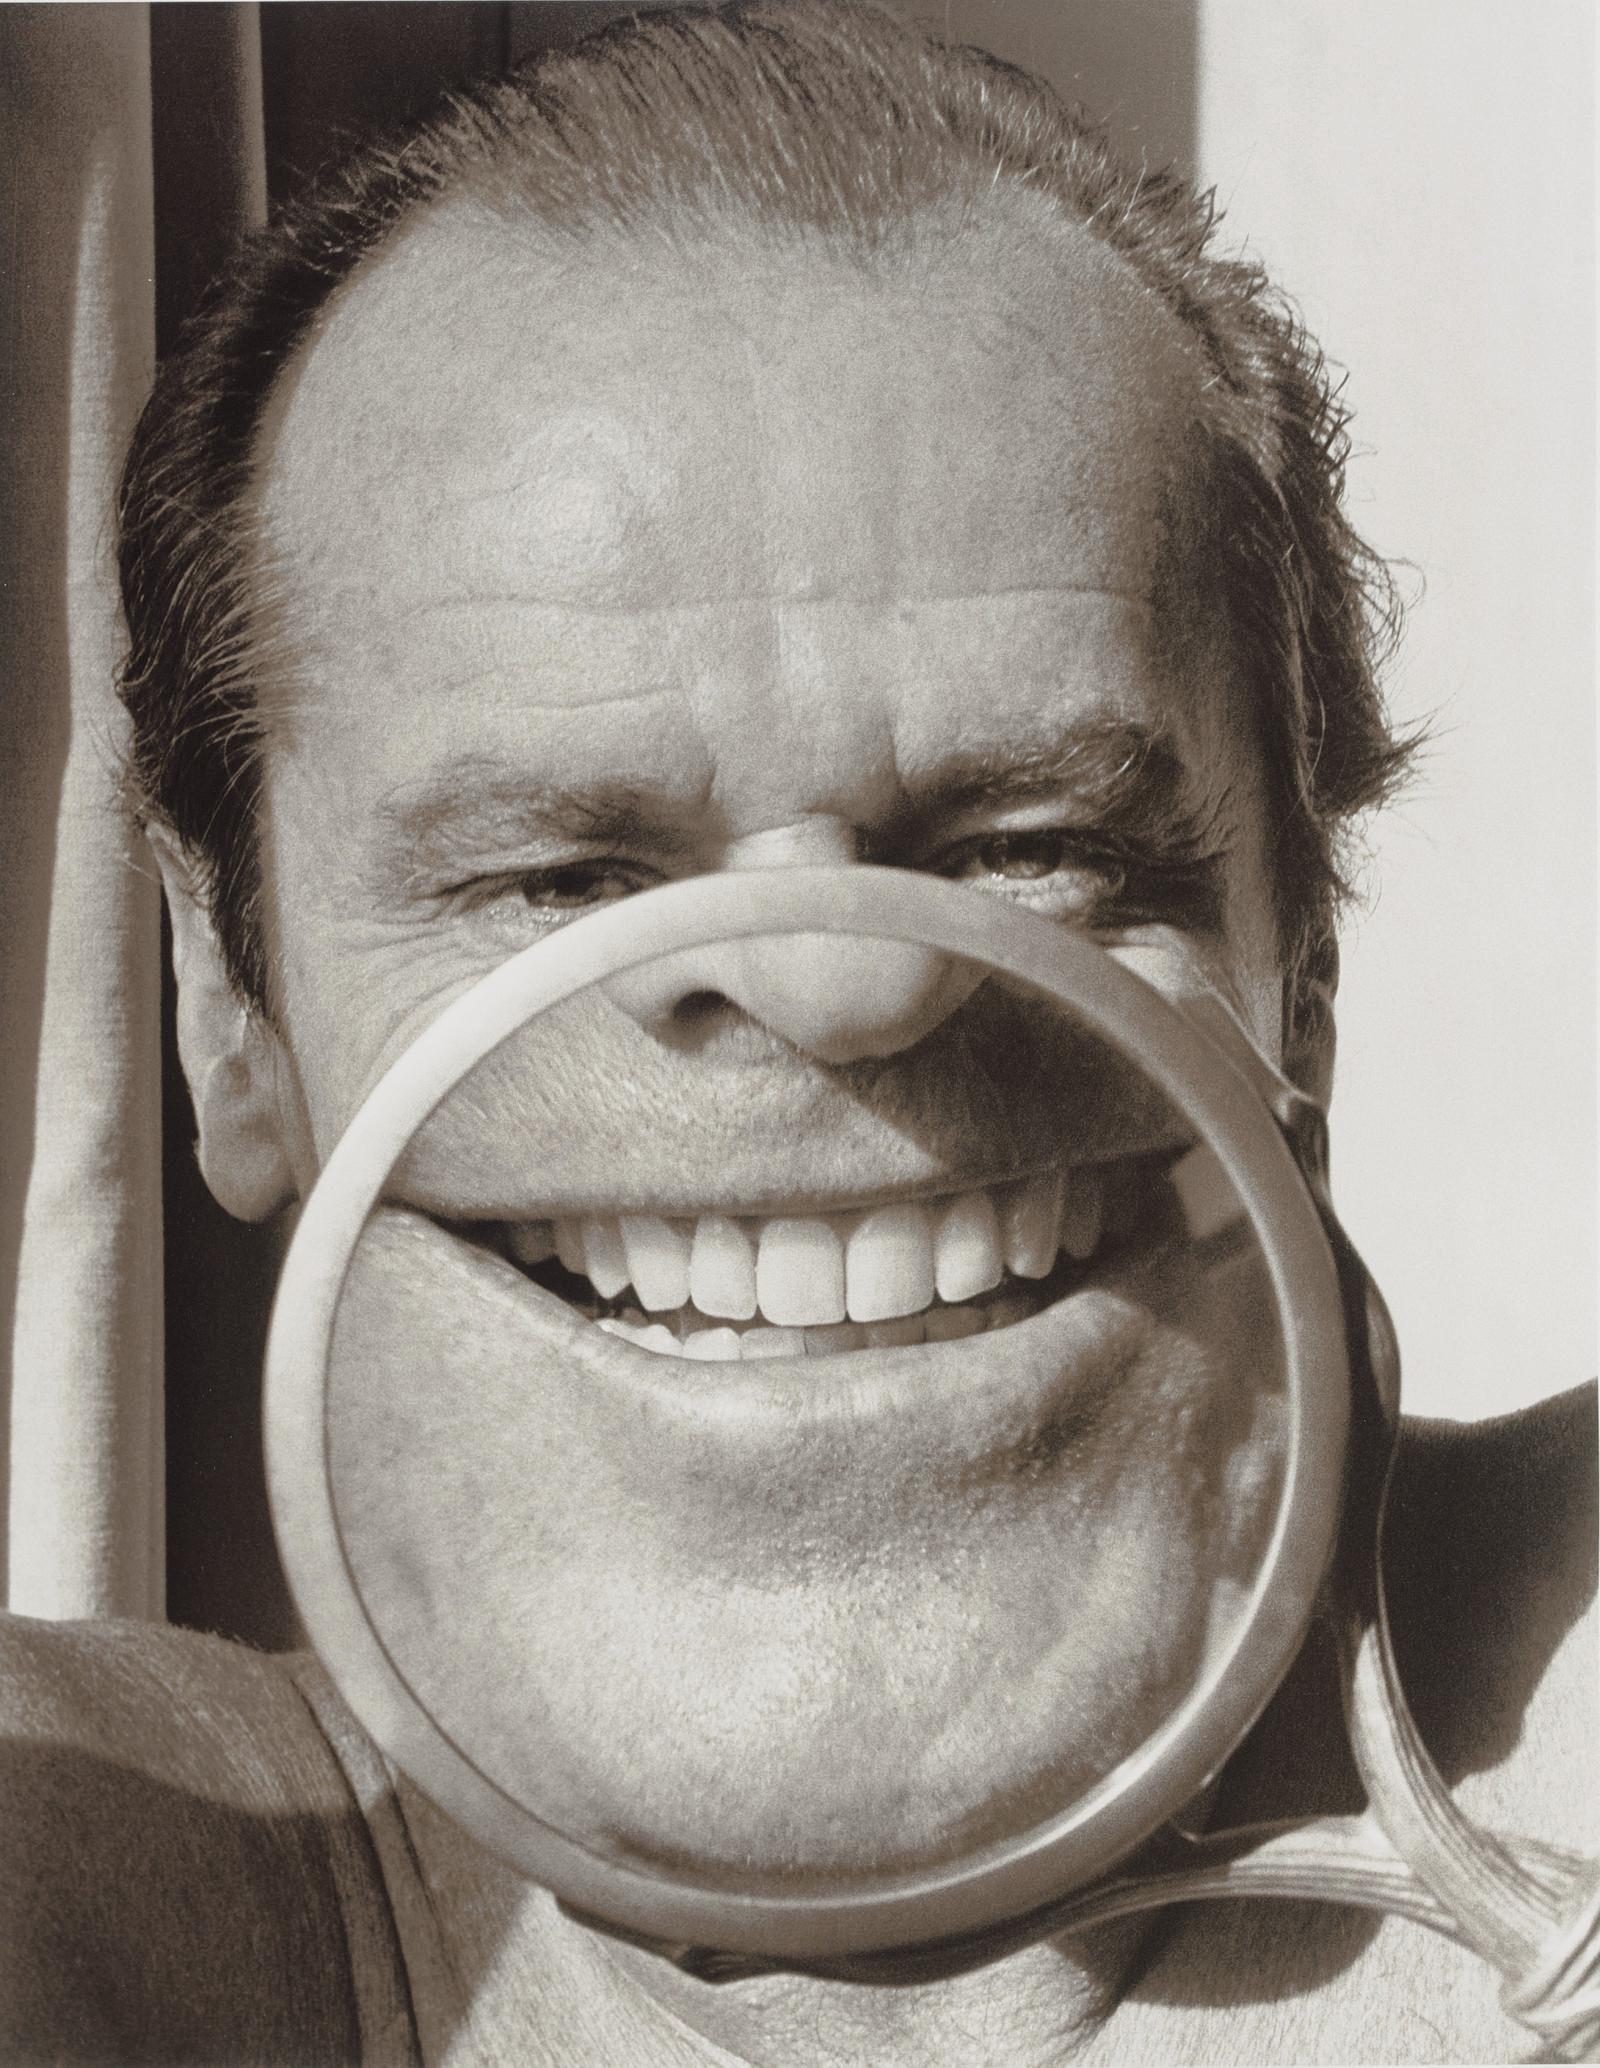 Jack Nicholson, Los Angeles, 1986